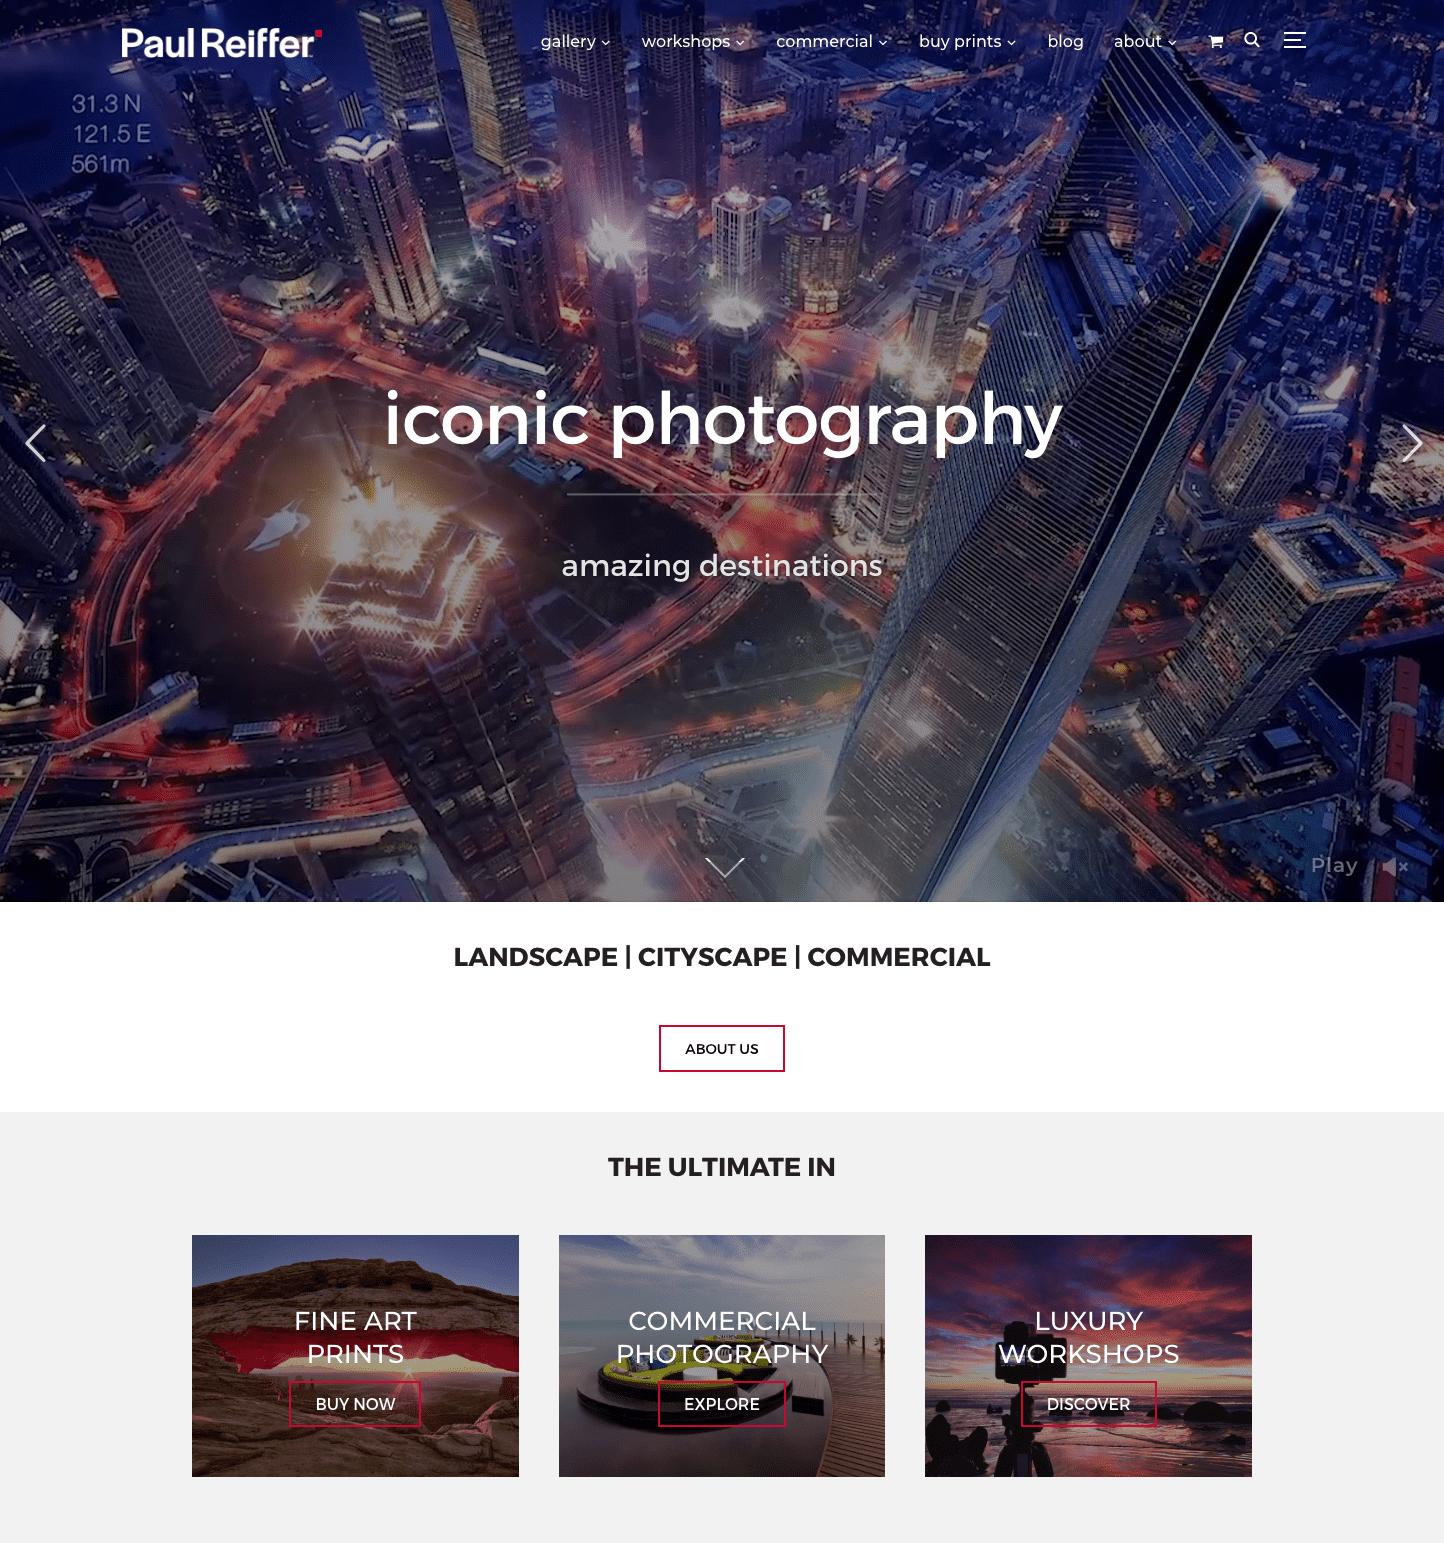 New design for the website